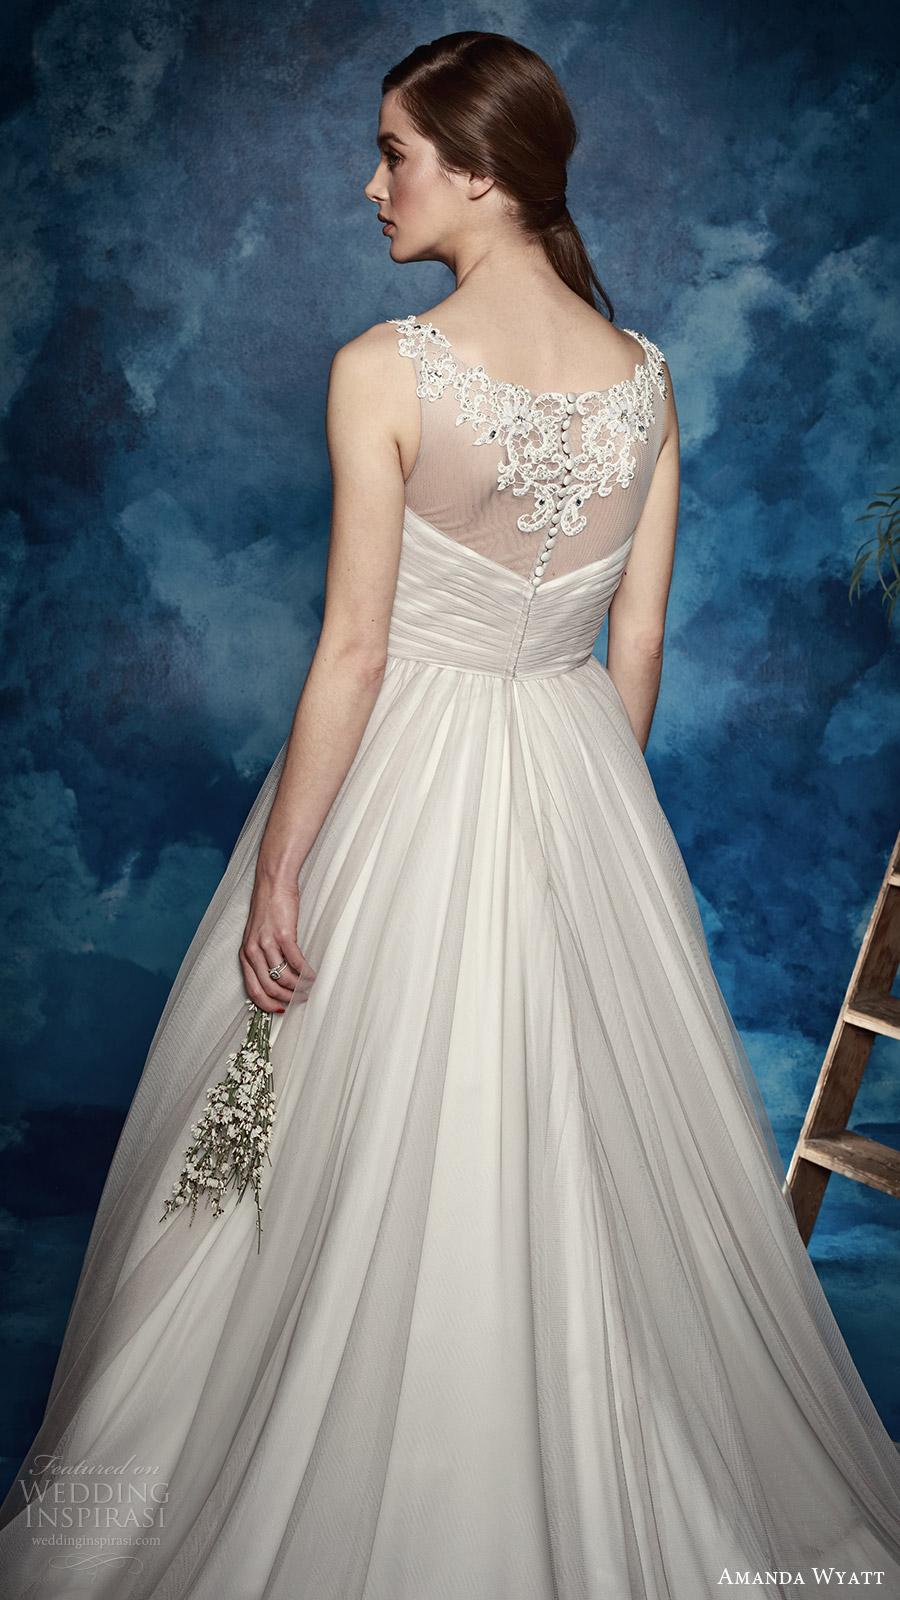 amanda wyatt bridal 2017 sleeveless lace straps vneck ruched surplic bodice a line wedding dress (north) bv illusion back grey color romantic train